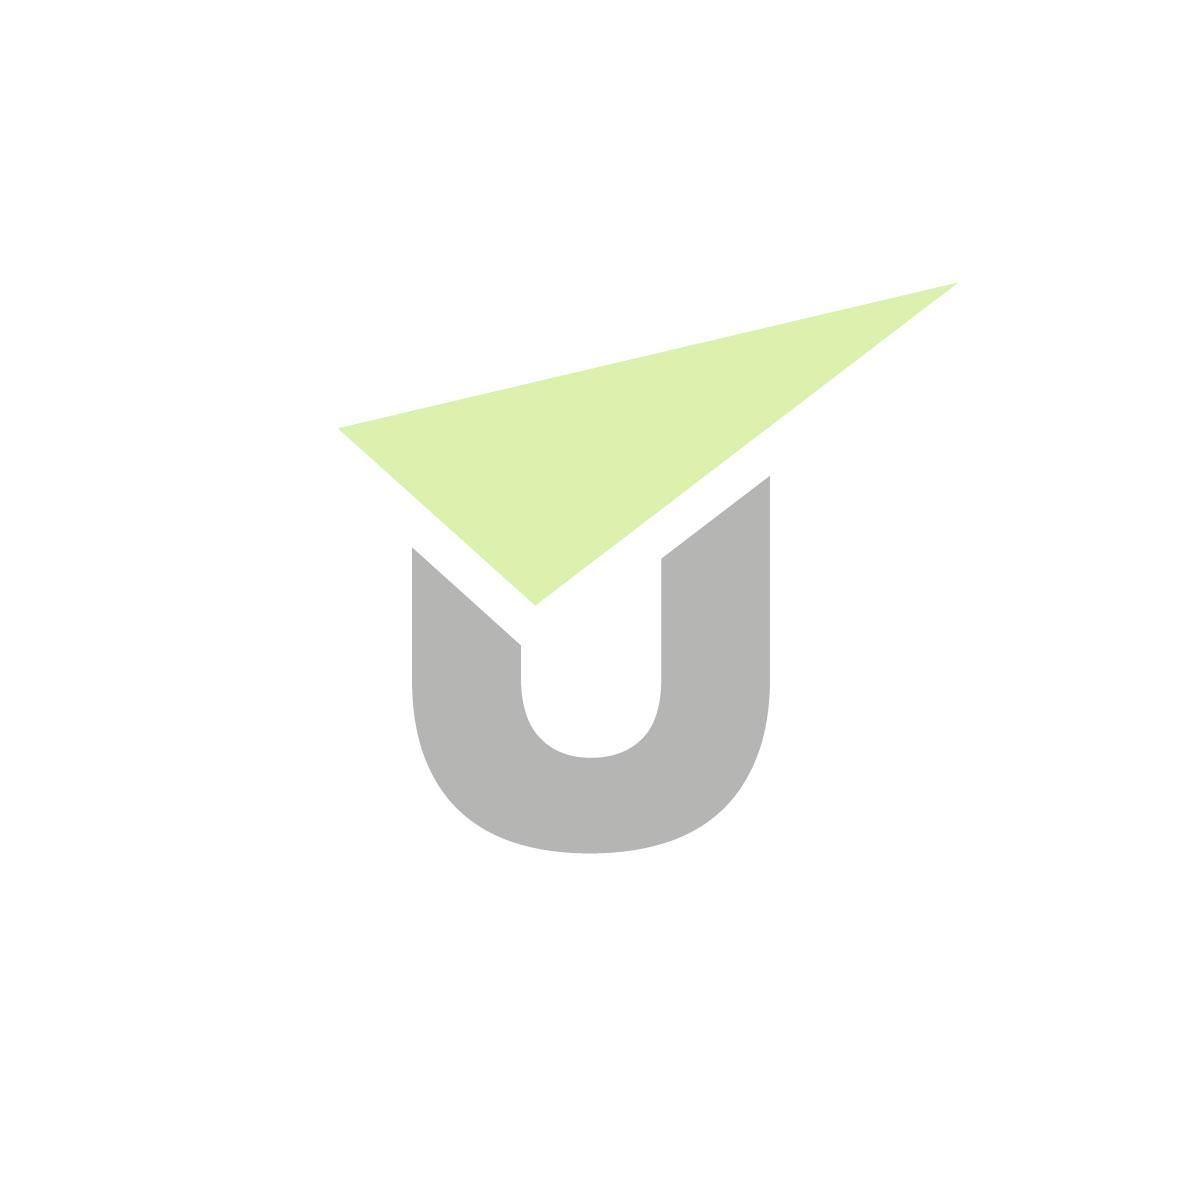 Máquina musculación GYM-100 como producto recomendado